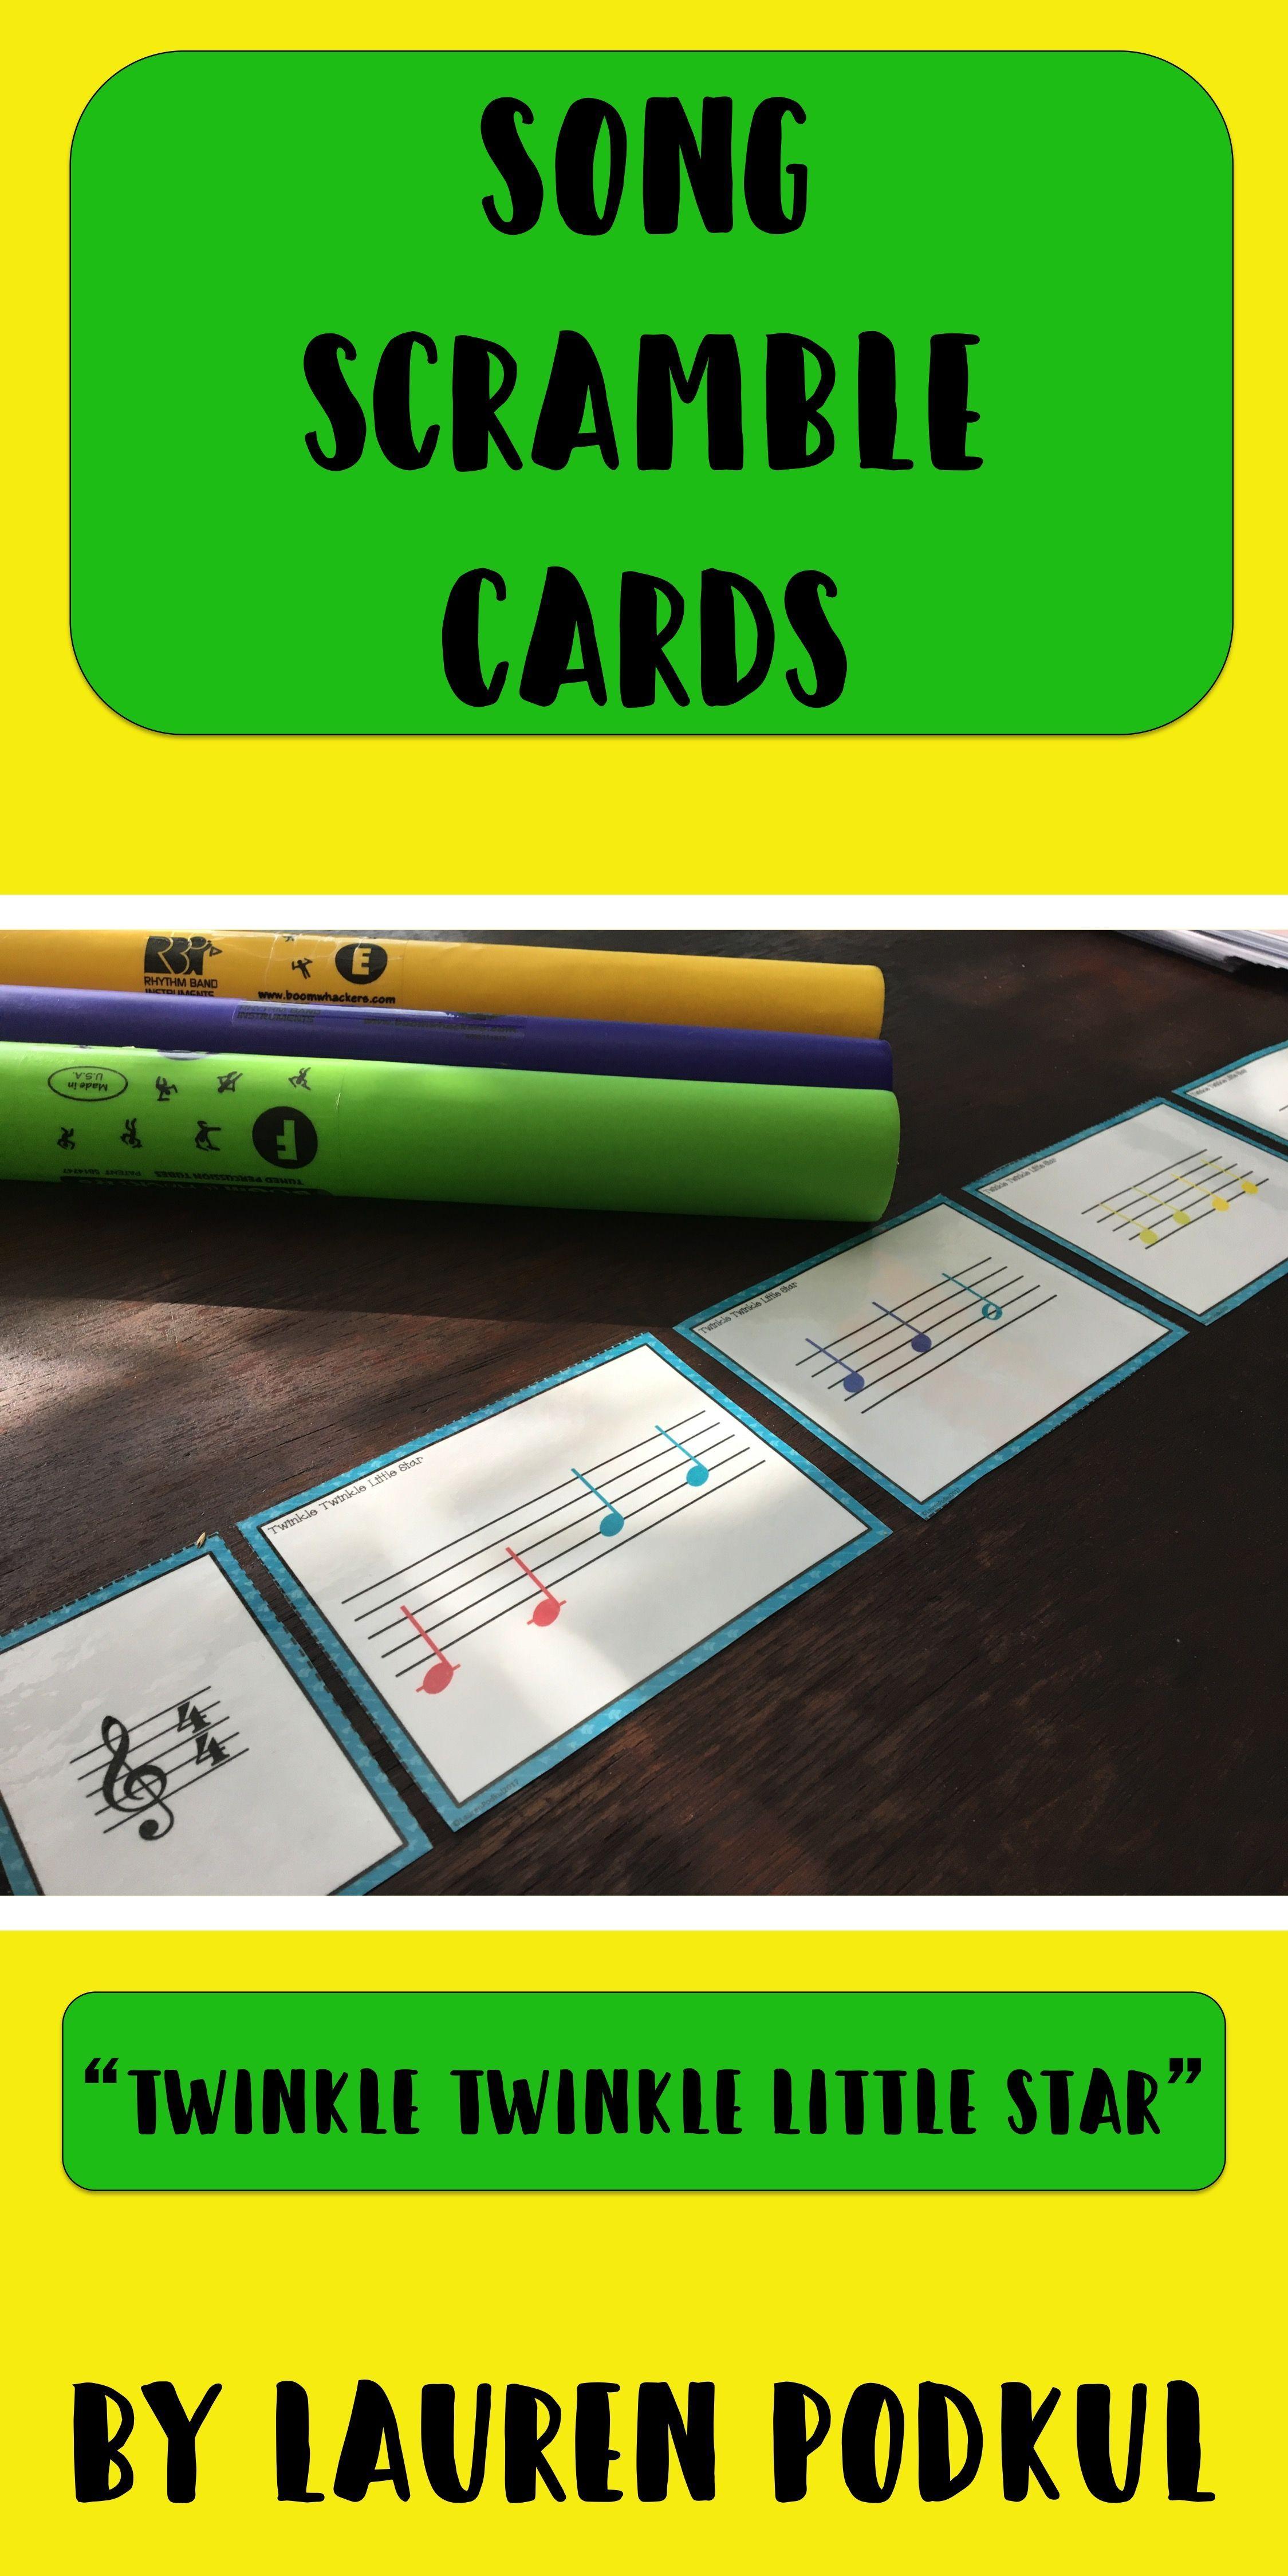 Song Scramble Cards